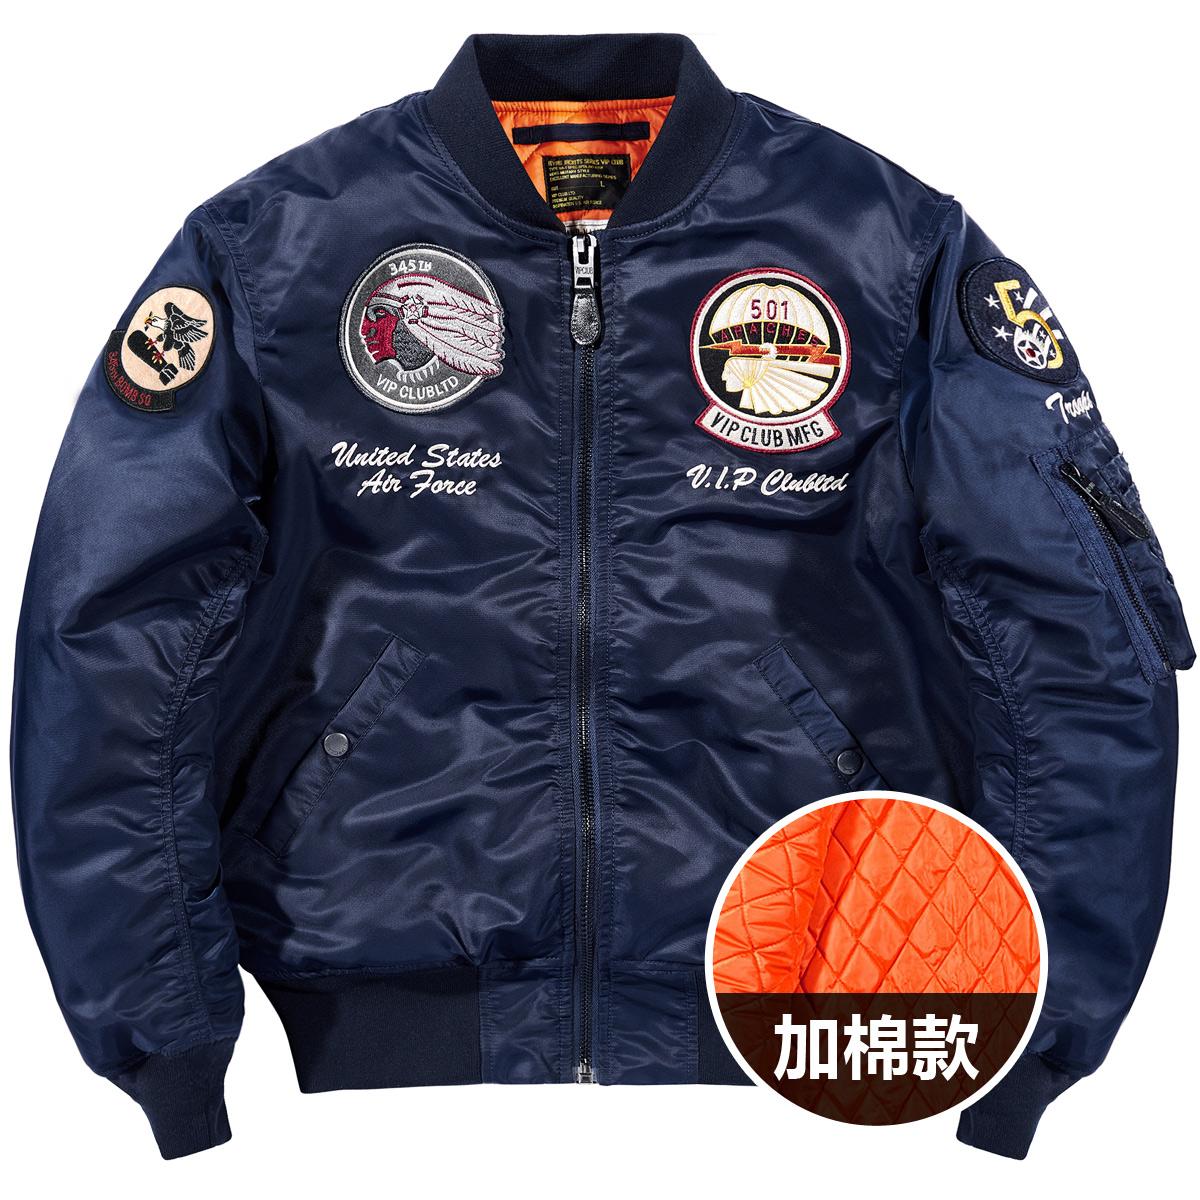 VIP冬装空军飞行员夹克男加厚大码工装外套冬季棉衣刺绣棒球服潮